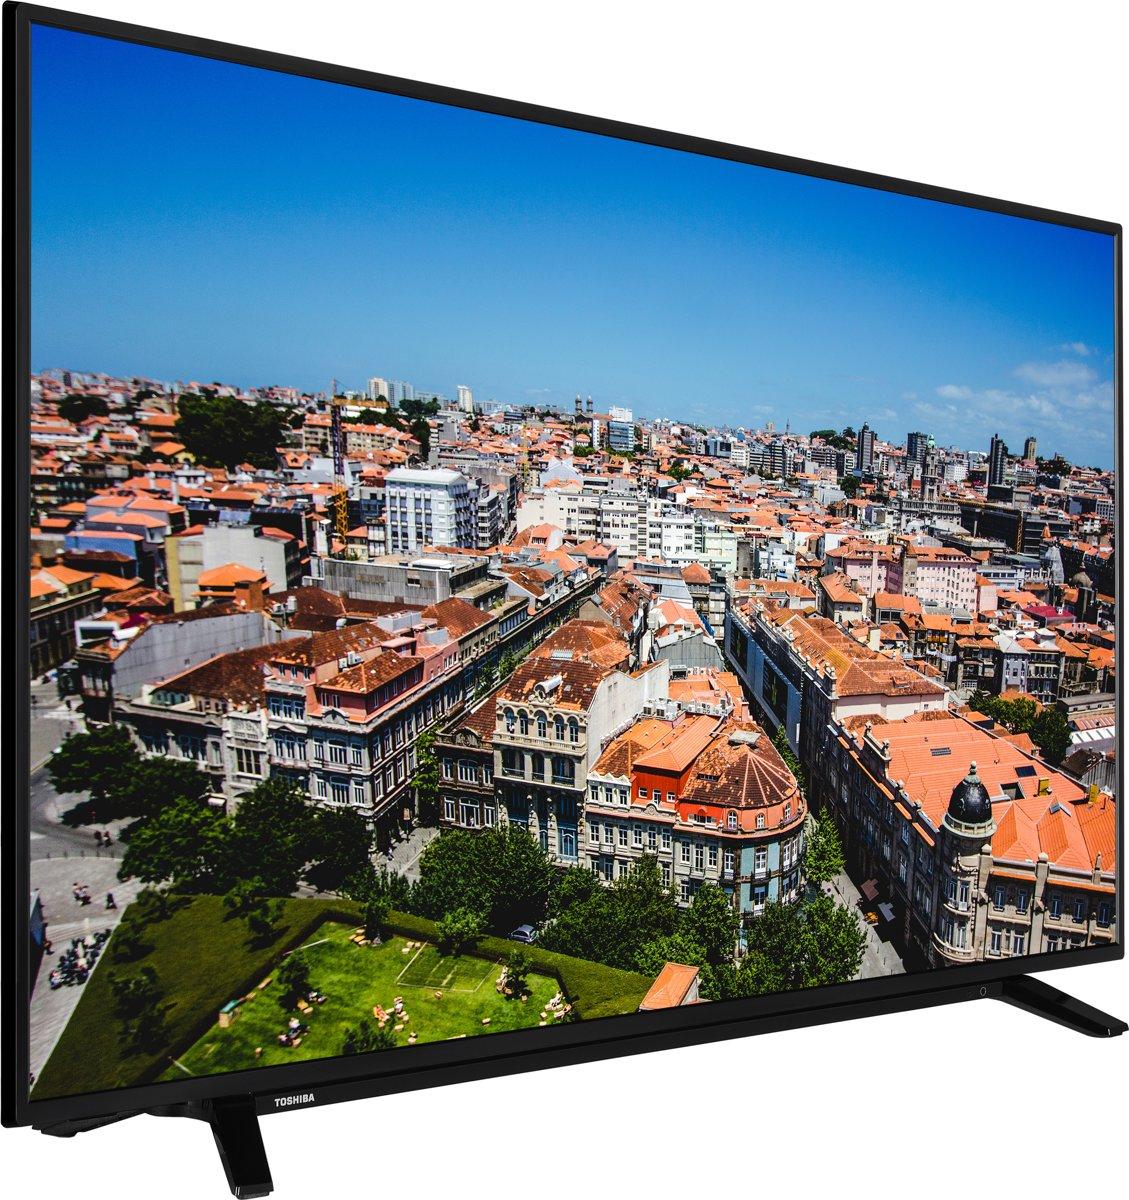 "(Black Friday) Toshiba 4K Ultra HD wifi smart tv 55""@Dirk"